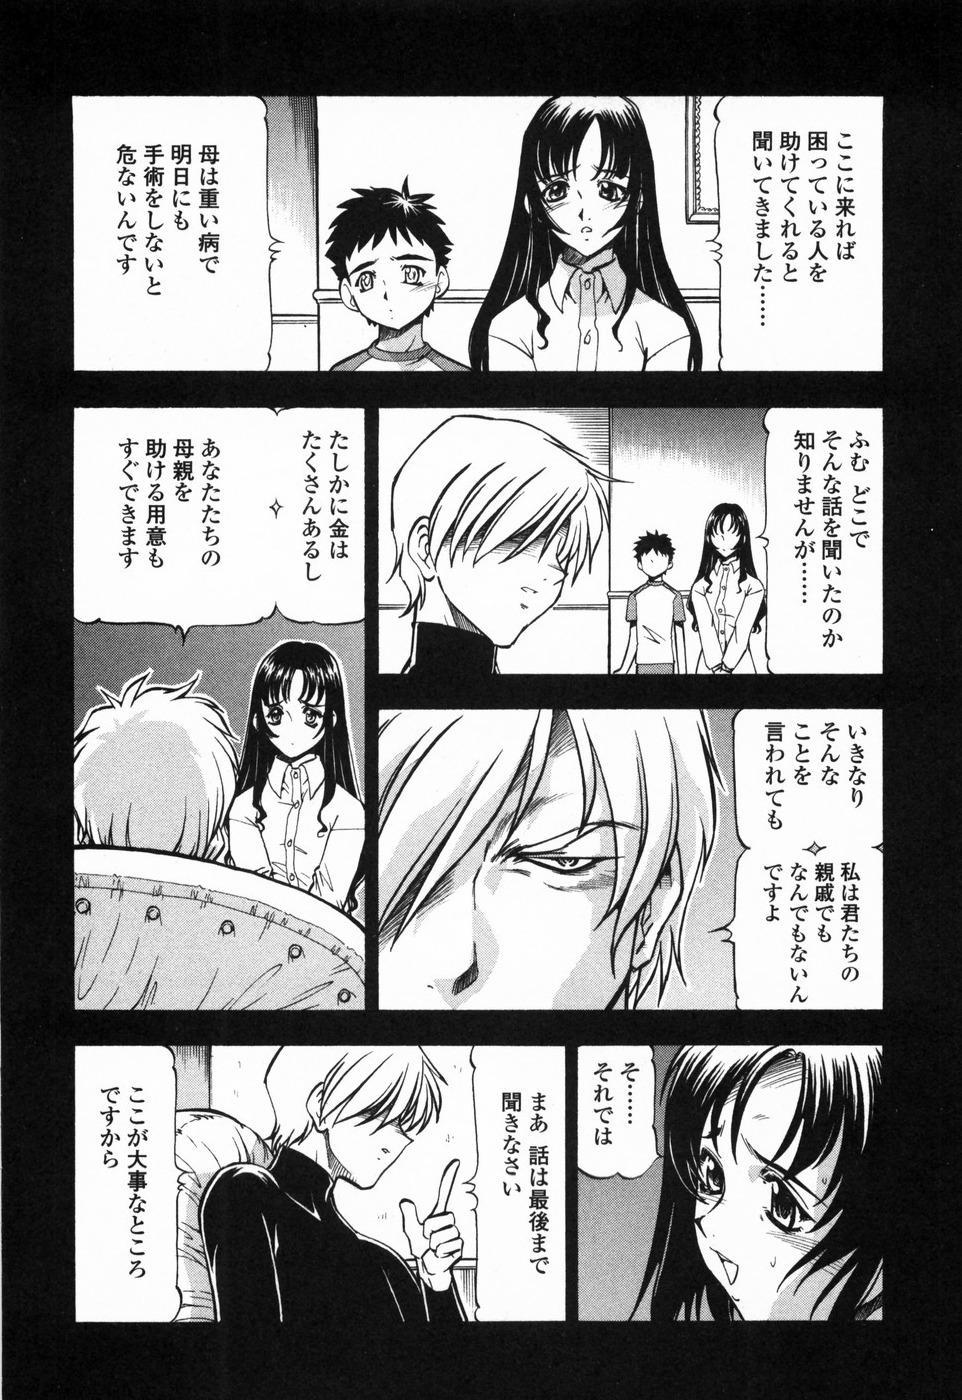 Kichiku Houteishiki - Equation of brutal person 95